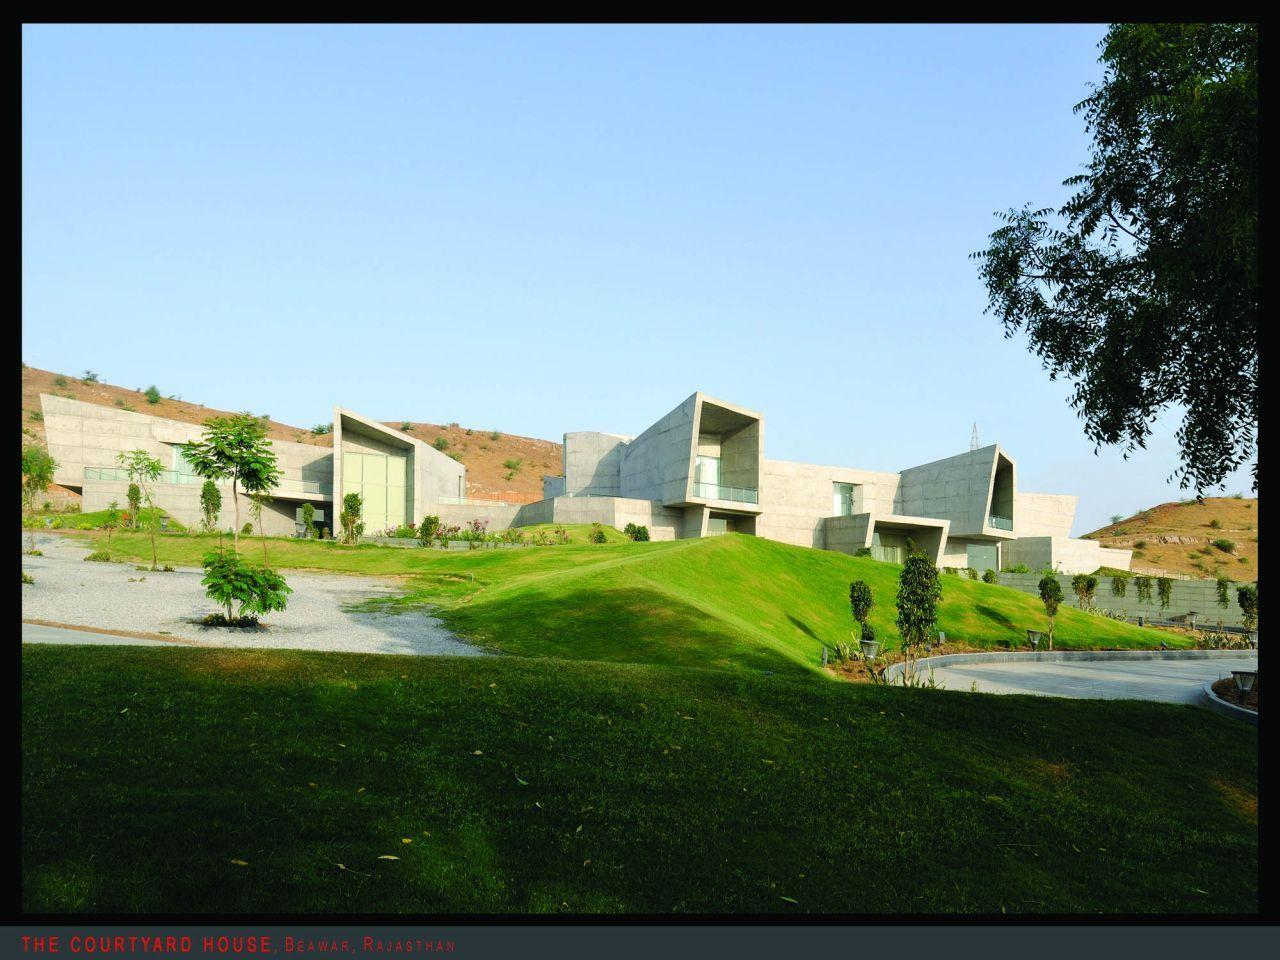 Casa Pátio / Sanjay Puri Architects